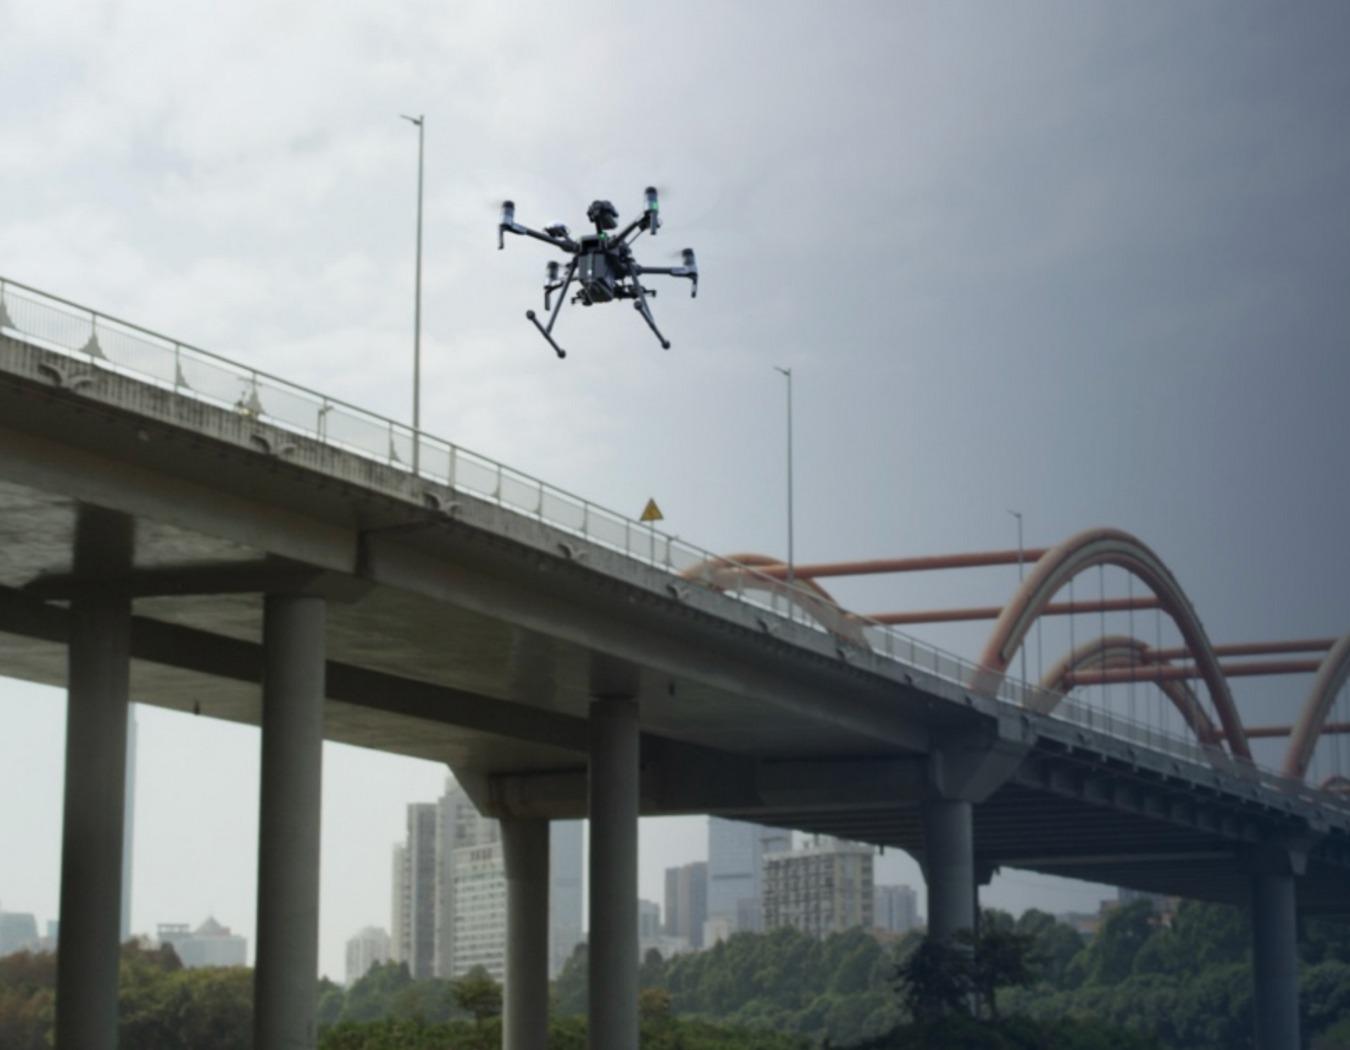 DJI Matrice 200 Series Bridge Inspection